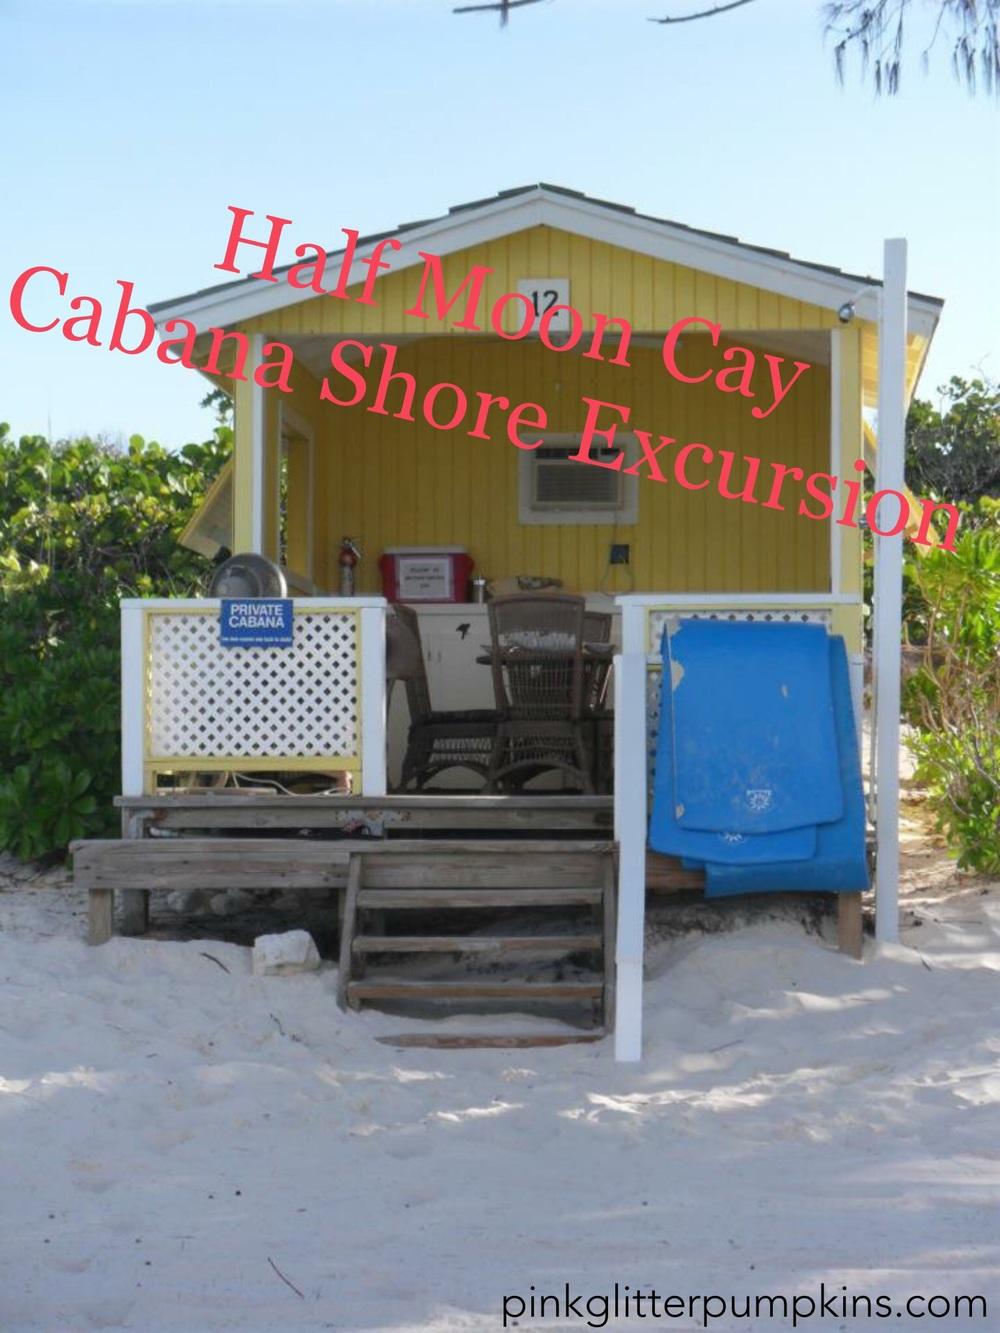 Half Moon Cay Cabana Shore Excursion Pink Glitter Pumpkins